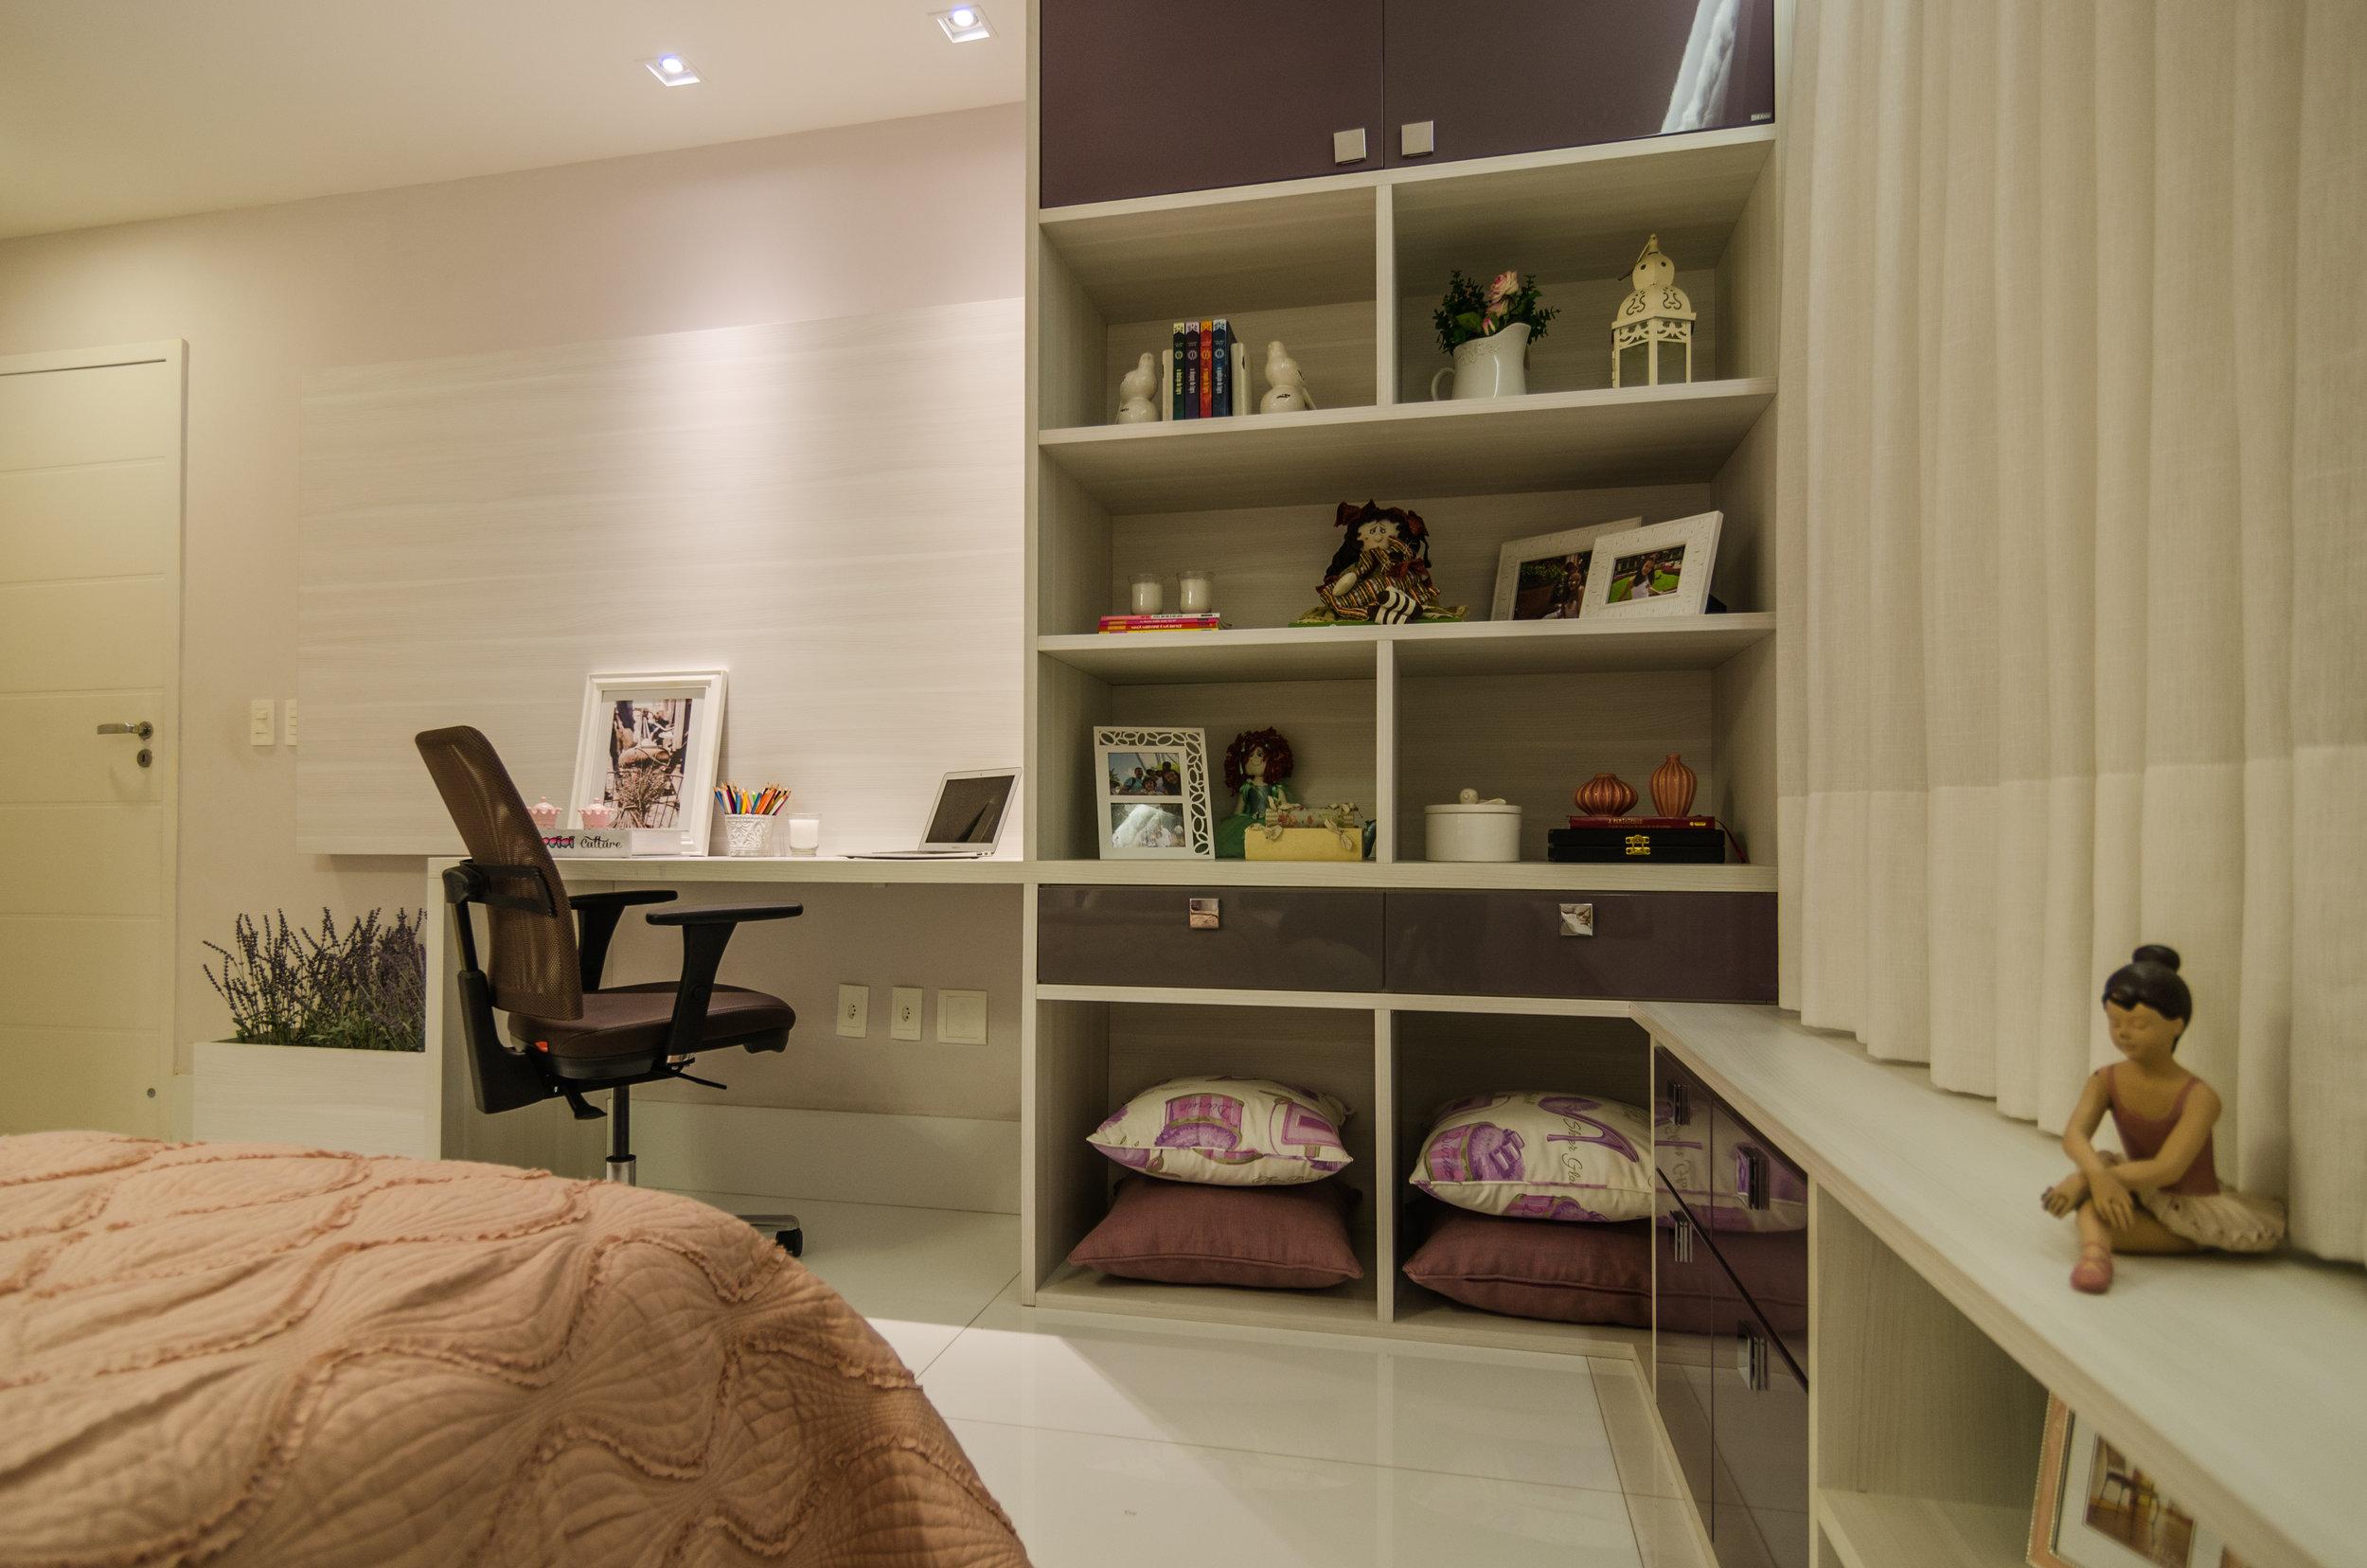 projeto-arquitetonico-alexandrepinto-duo-arquitetura-casa-07.jpg